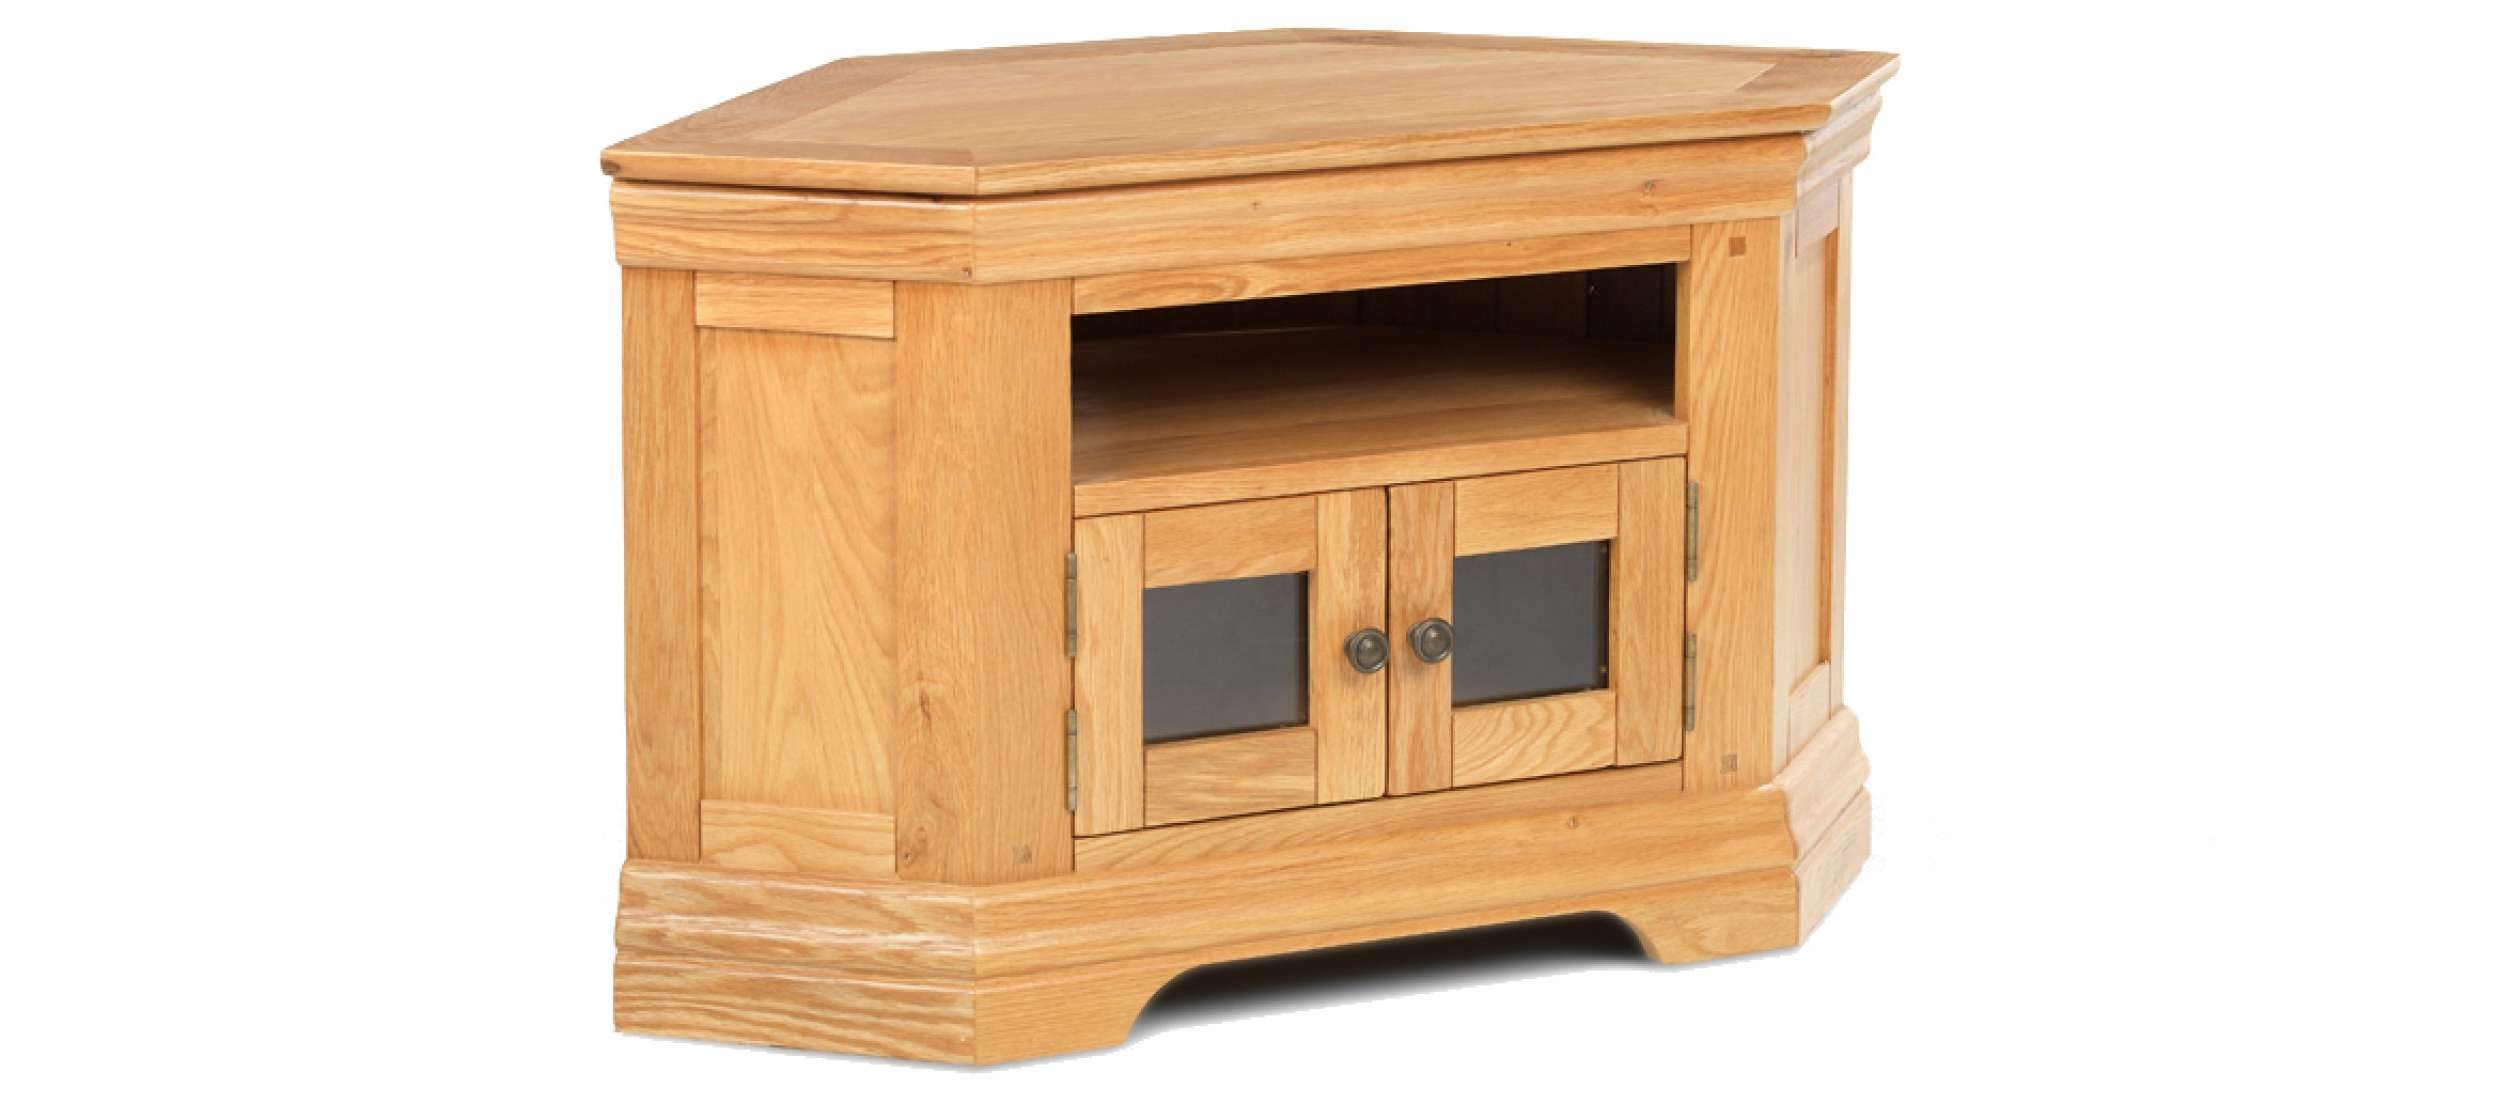 Constance Oak Corner Tv Cabinet | Quercus Living In Corner Tv Cabinets (View 11 of 20)